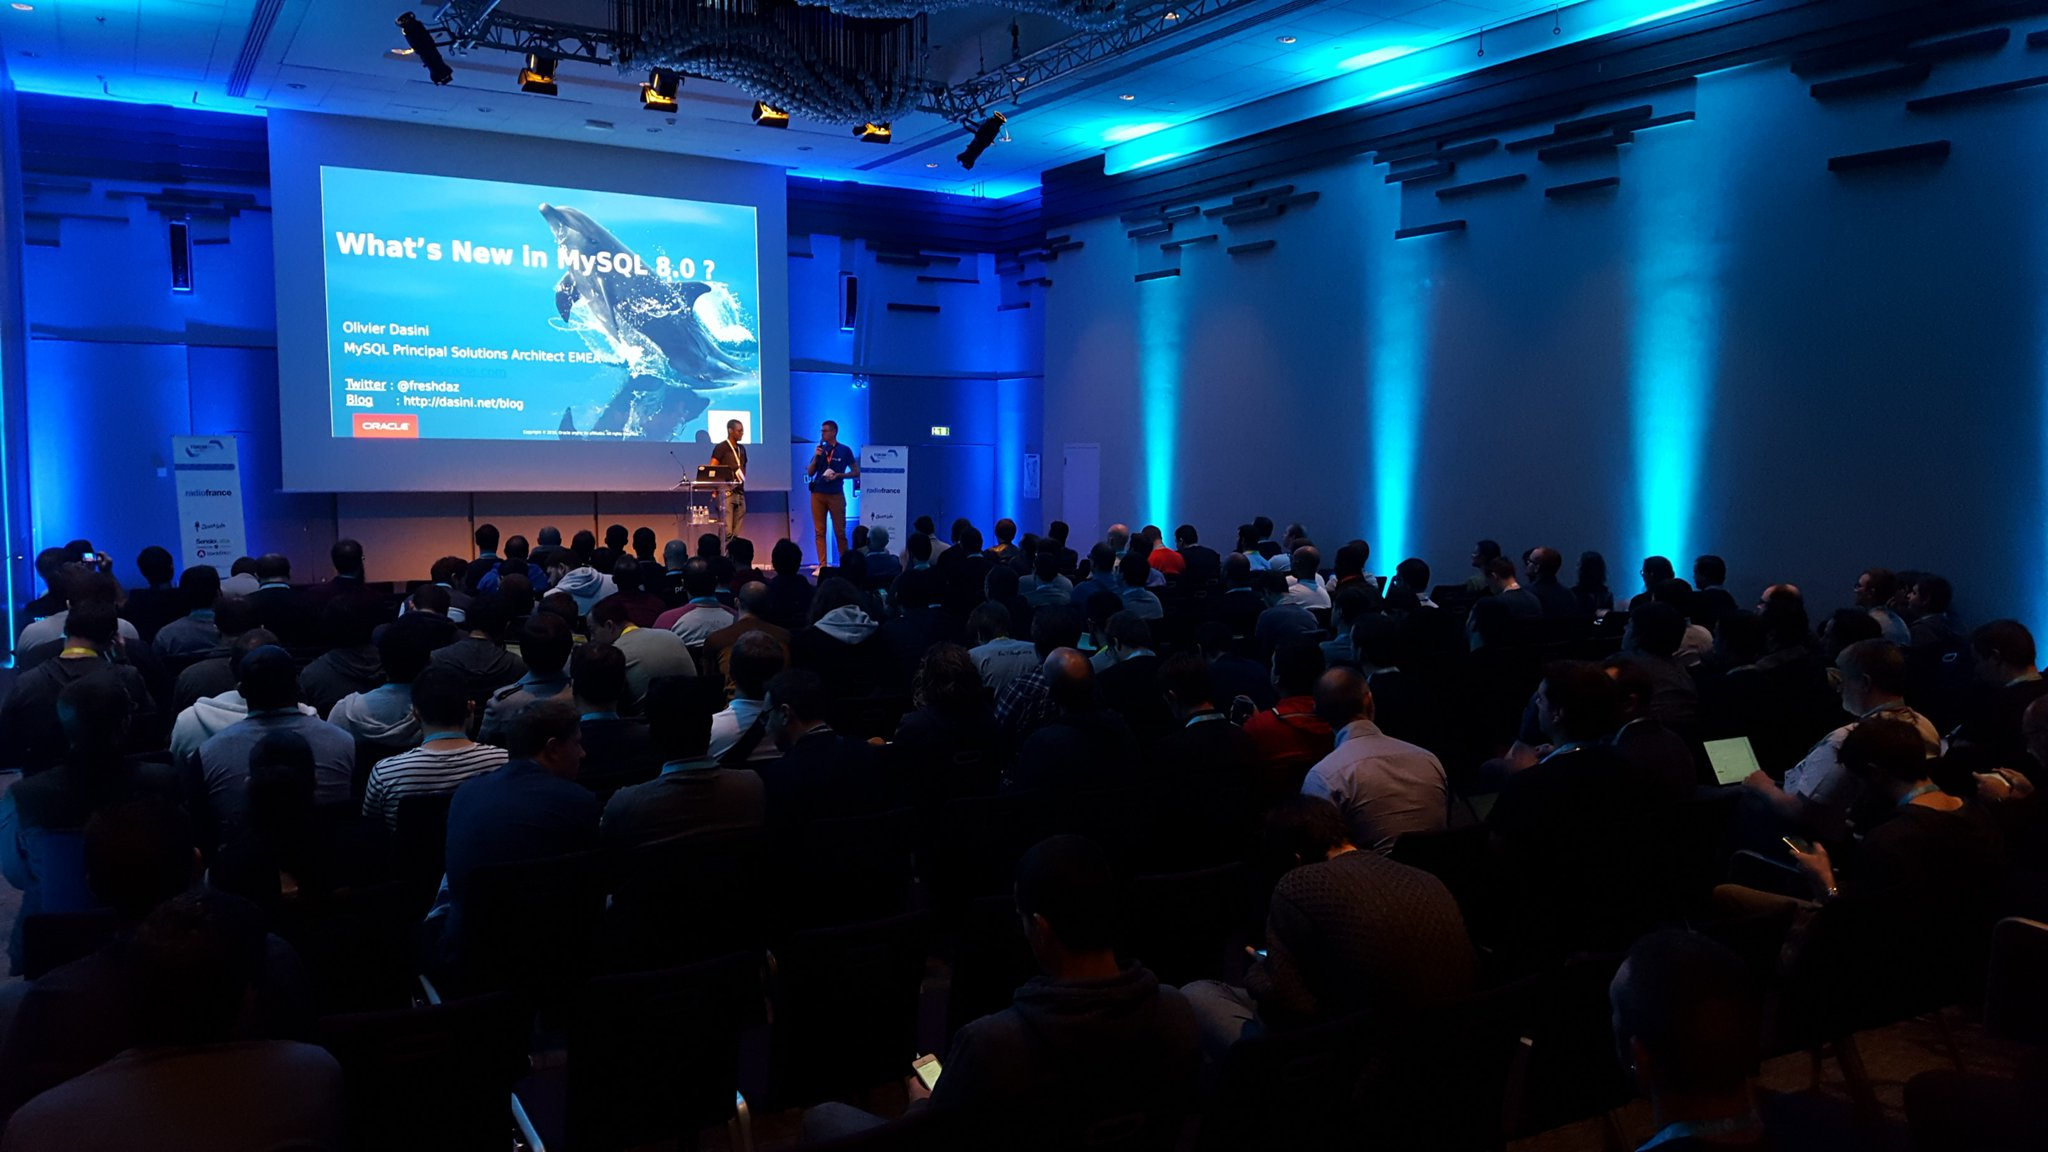 AFUP Forum PHP 2018 - MySQL 8.0